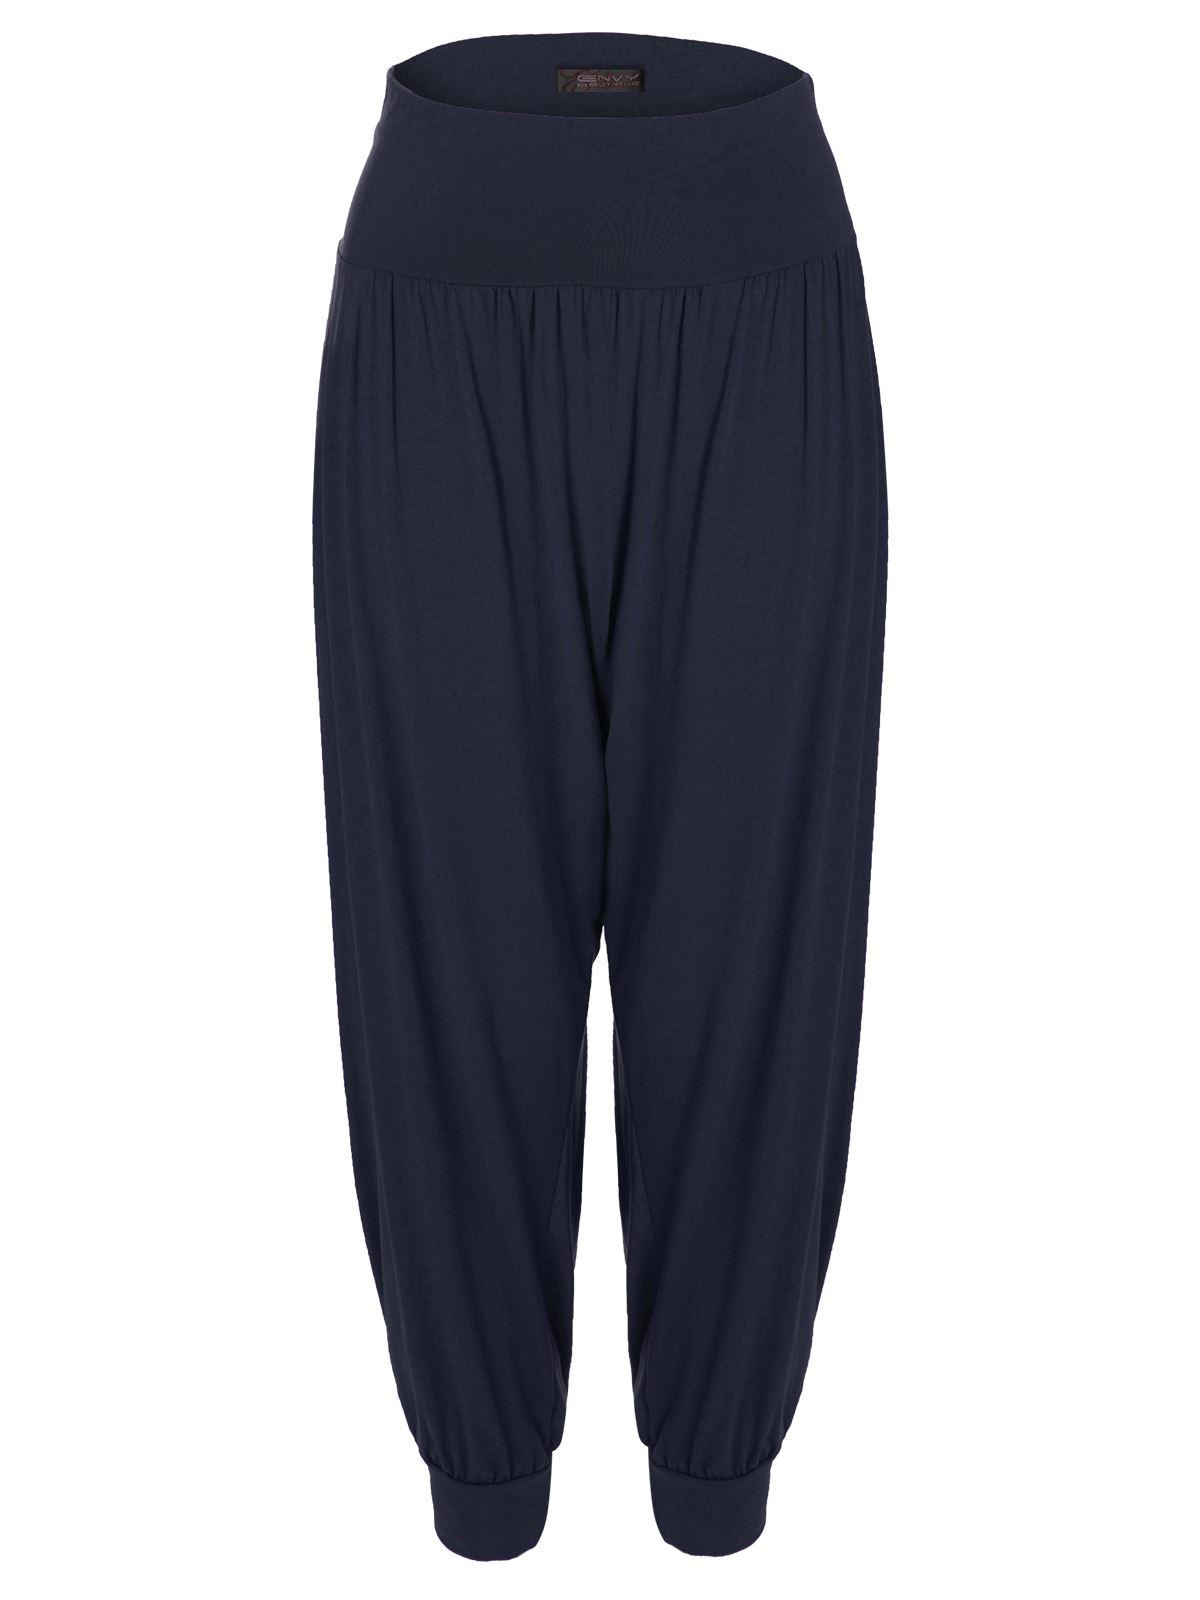 Awesome Ladies Summer Chiffon Long Pants Casual Loose Harem Pants Pencil Pants | EBay